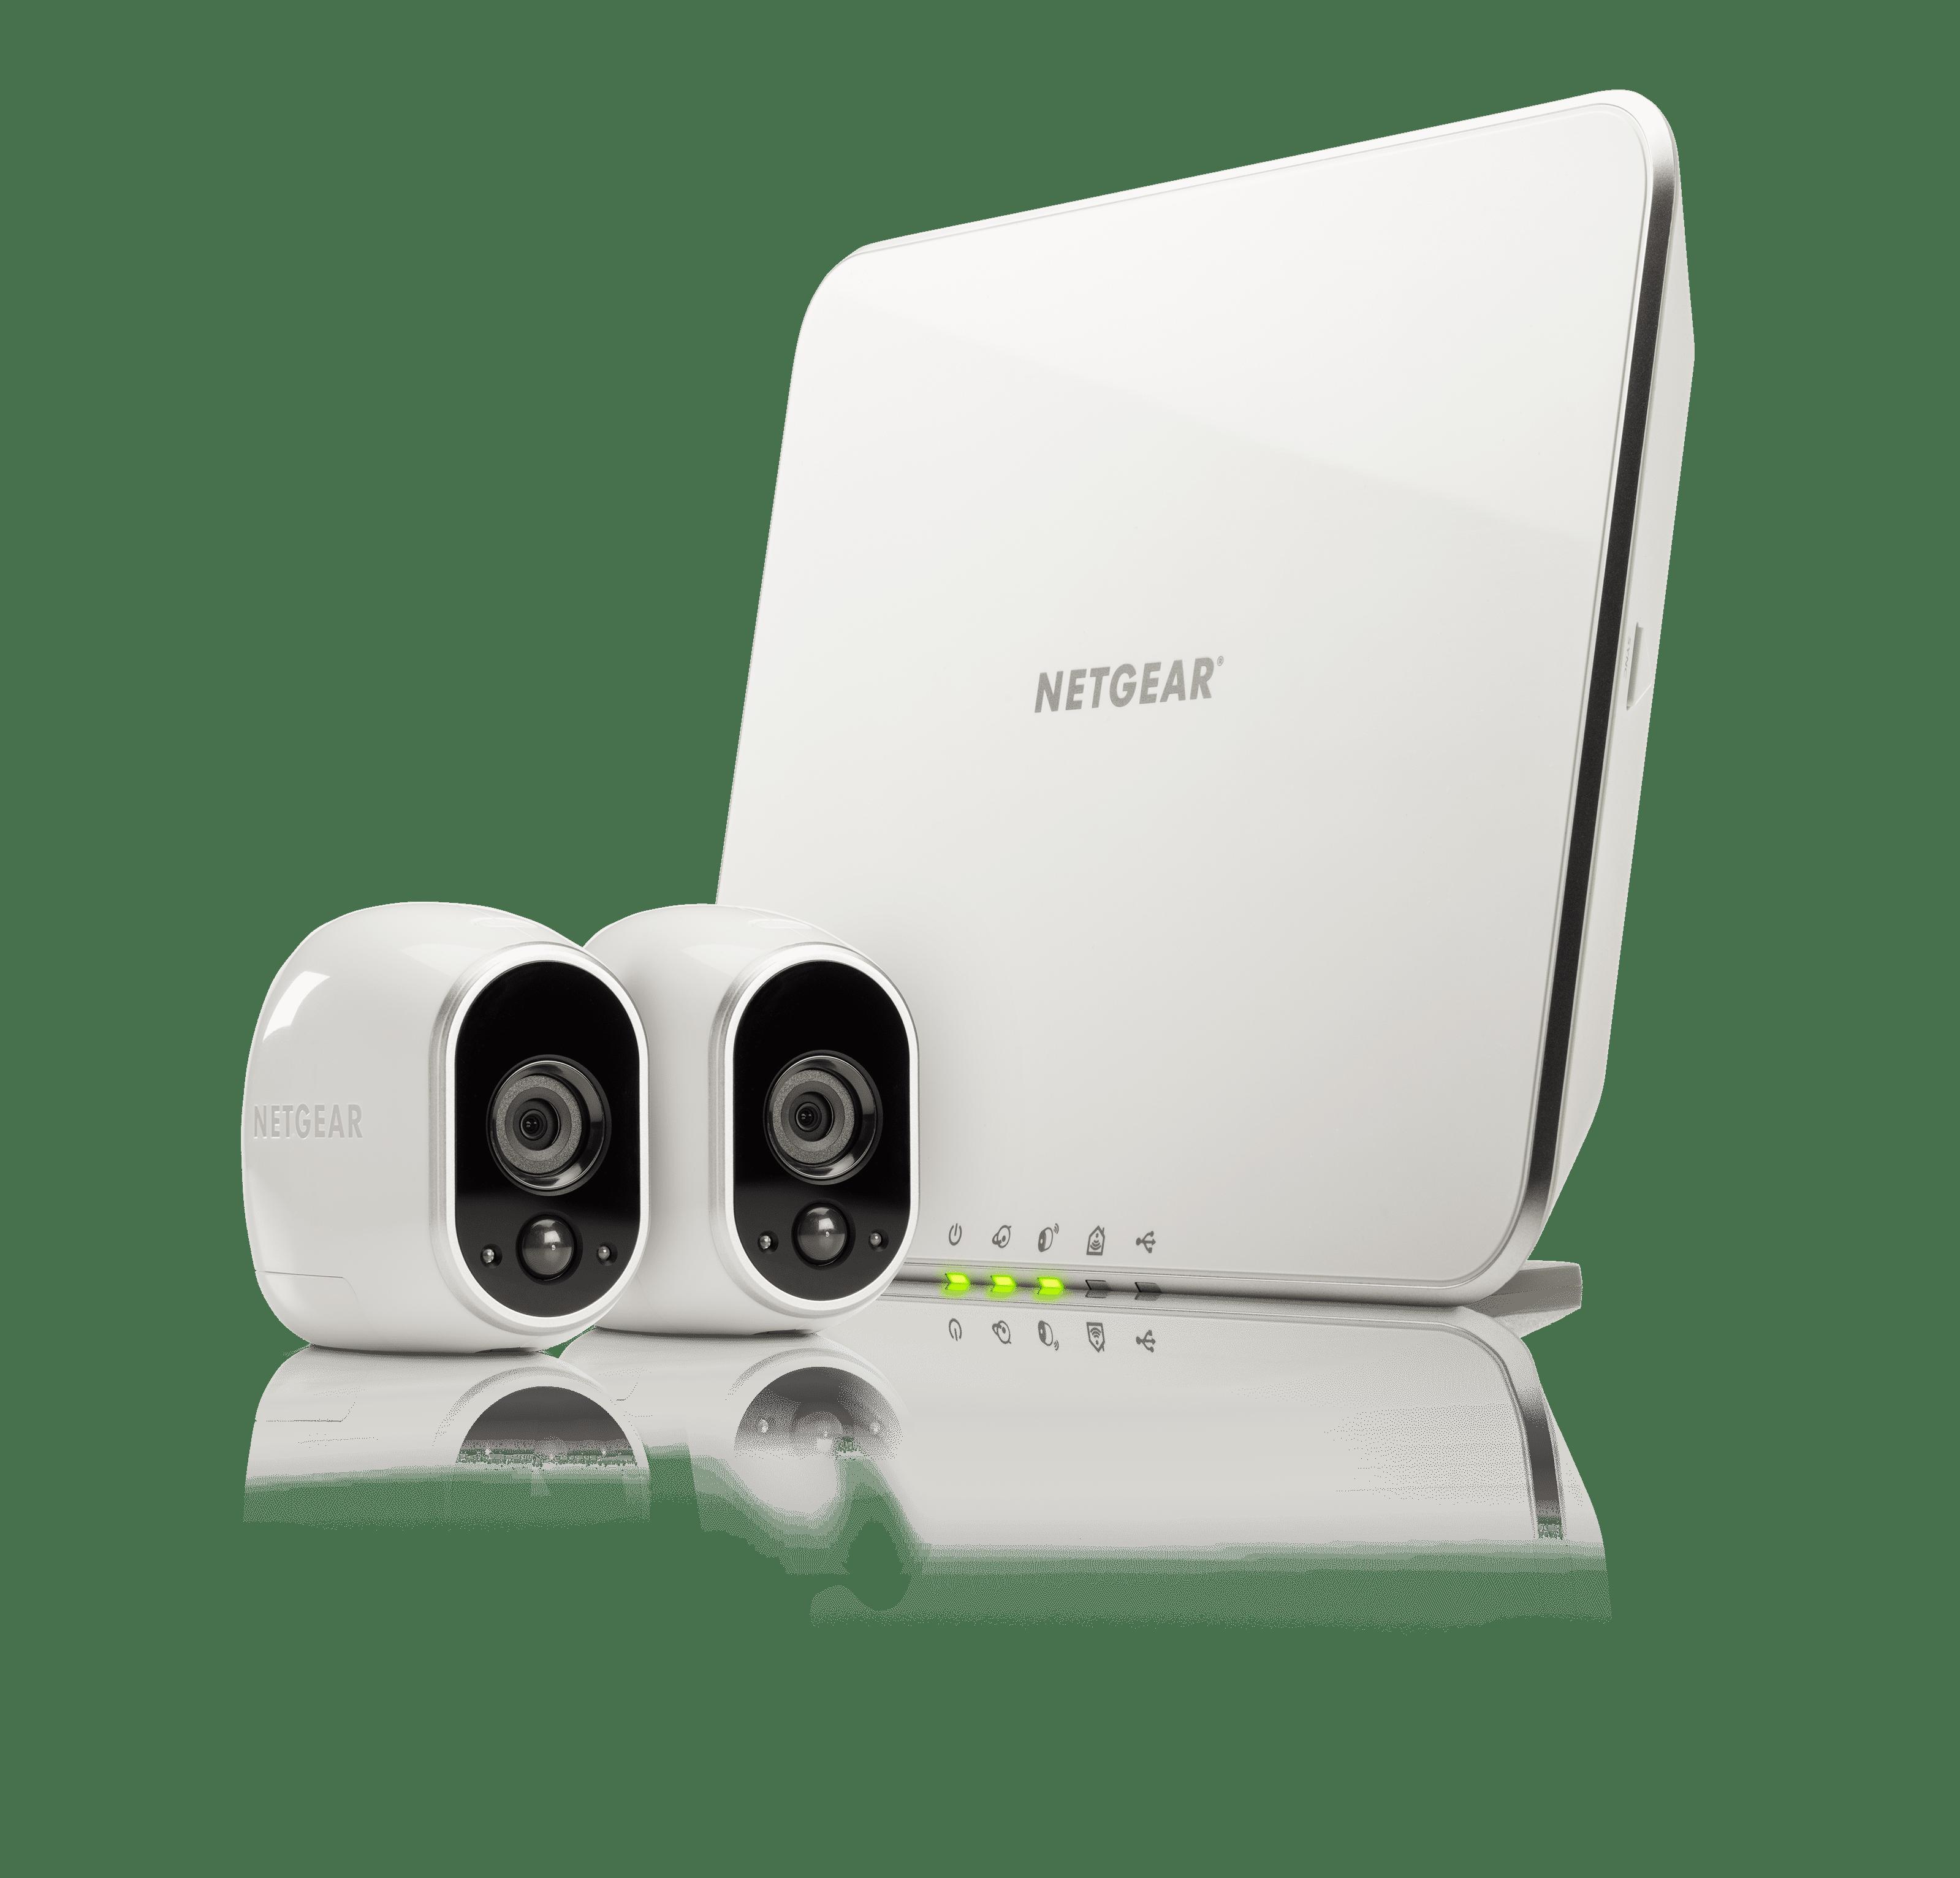 Arlo Security Camera System - 2 Wire-Free HD Cameras, Indoor/Outdoor, Night Vision (VMS3230)